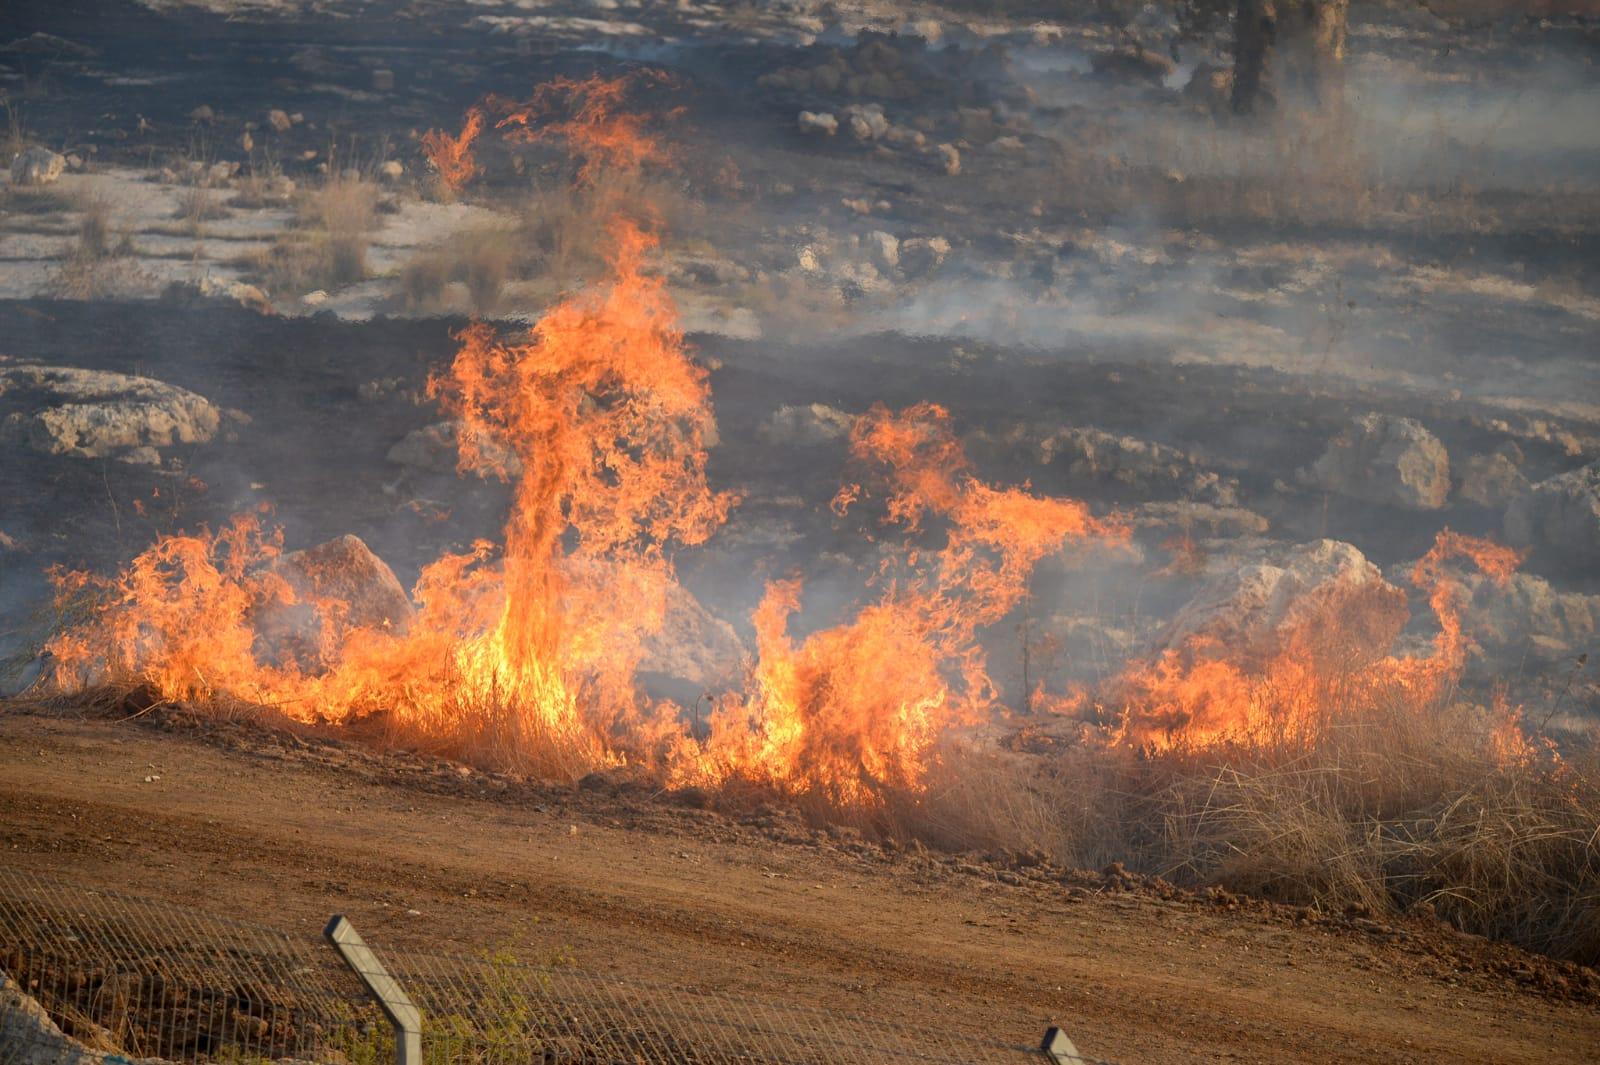 Photo of בשל מזג האוויר: צוותי כיבוי אש רבים ומטוסי כיבוי פועלים משעות הבוקר בשריפות גדולות בשטחים סמוך לראש העין ובאזור התעשייה בעיר